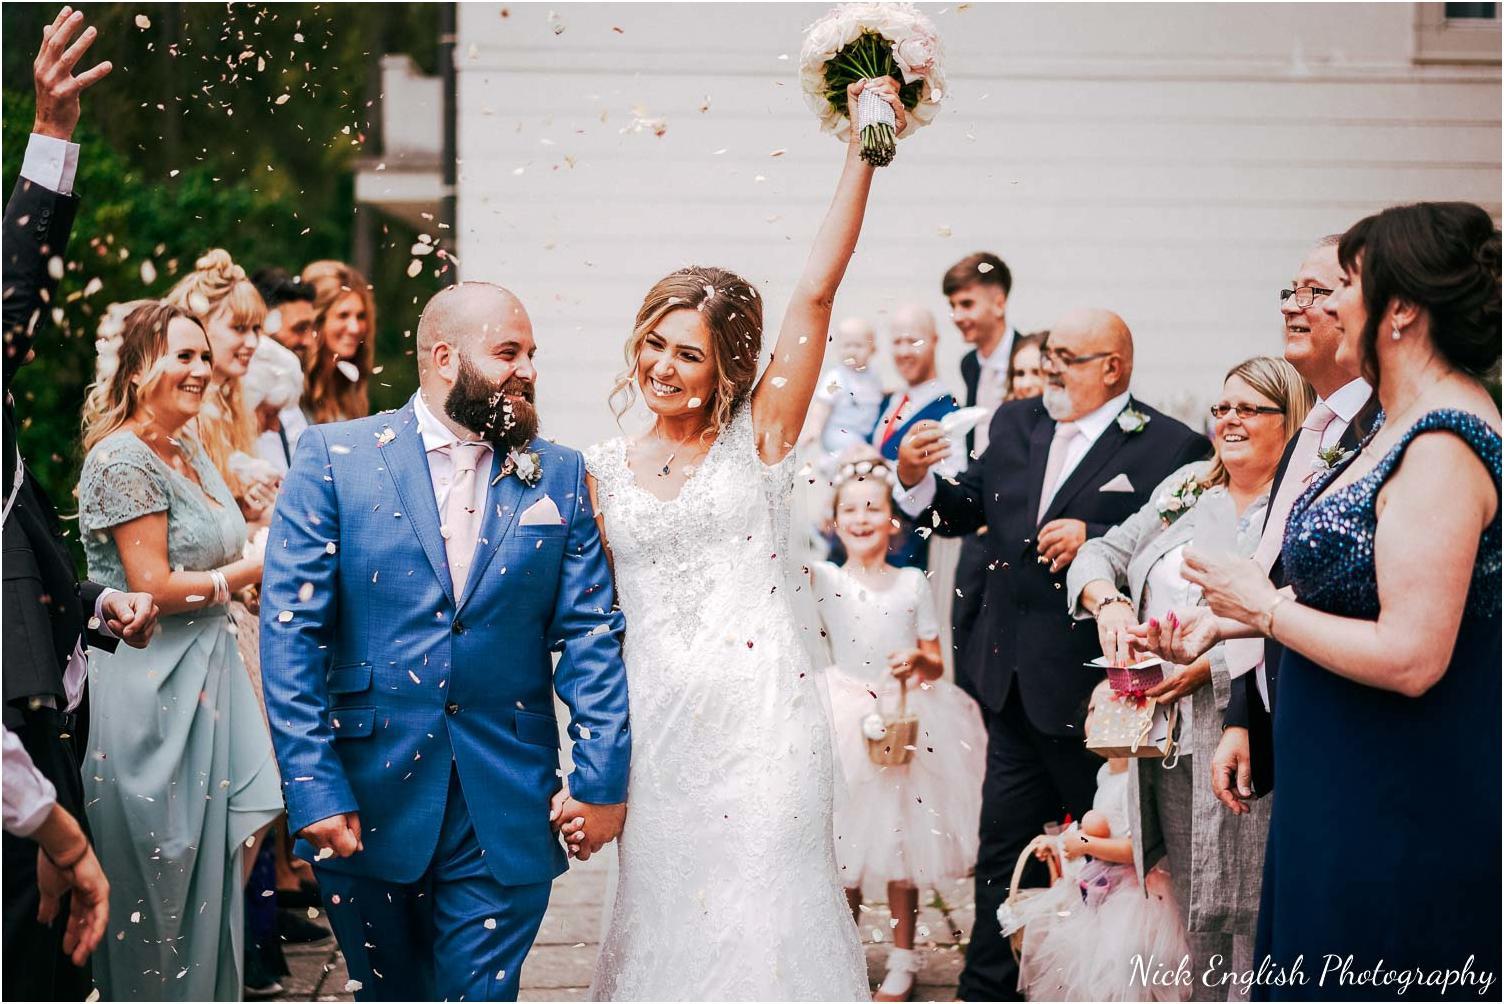 Destination_Wedding_Photographer_Slovenia_Nick_English_Photography-56.jpg